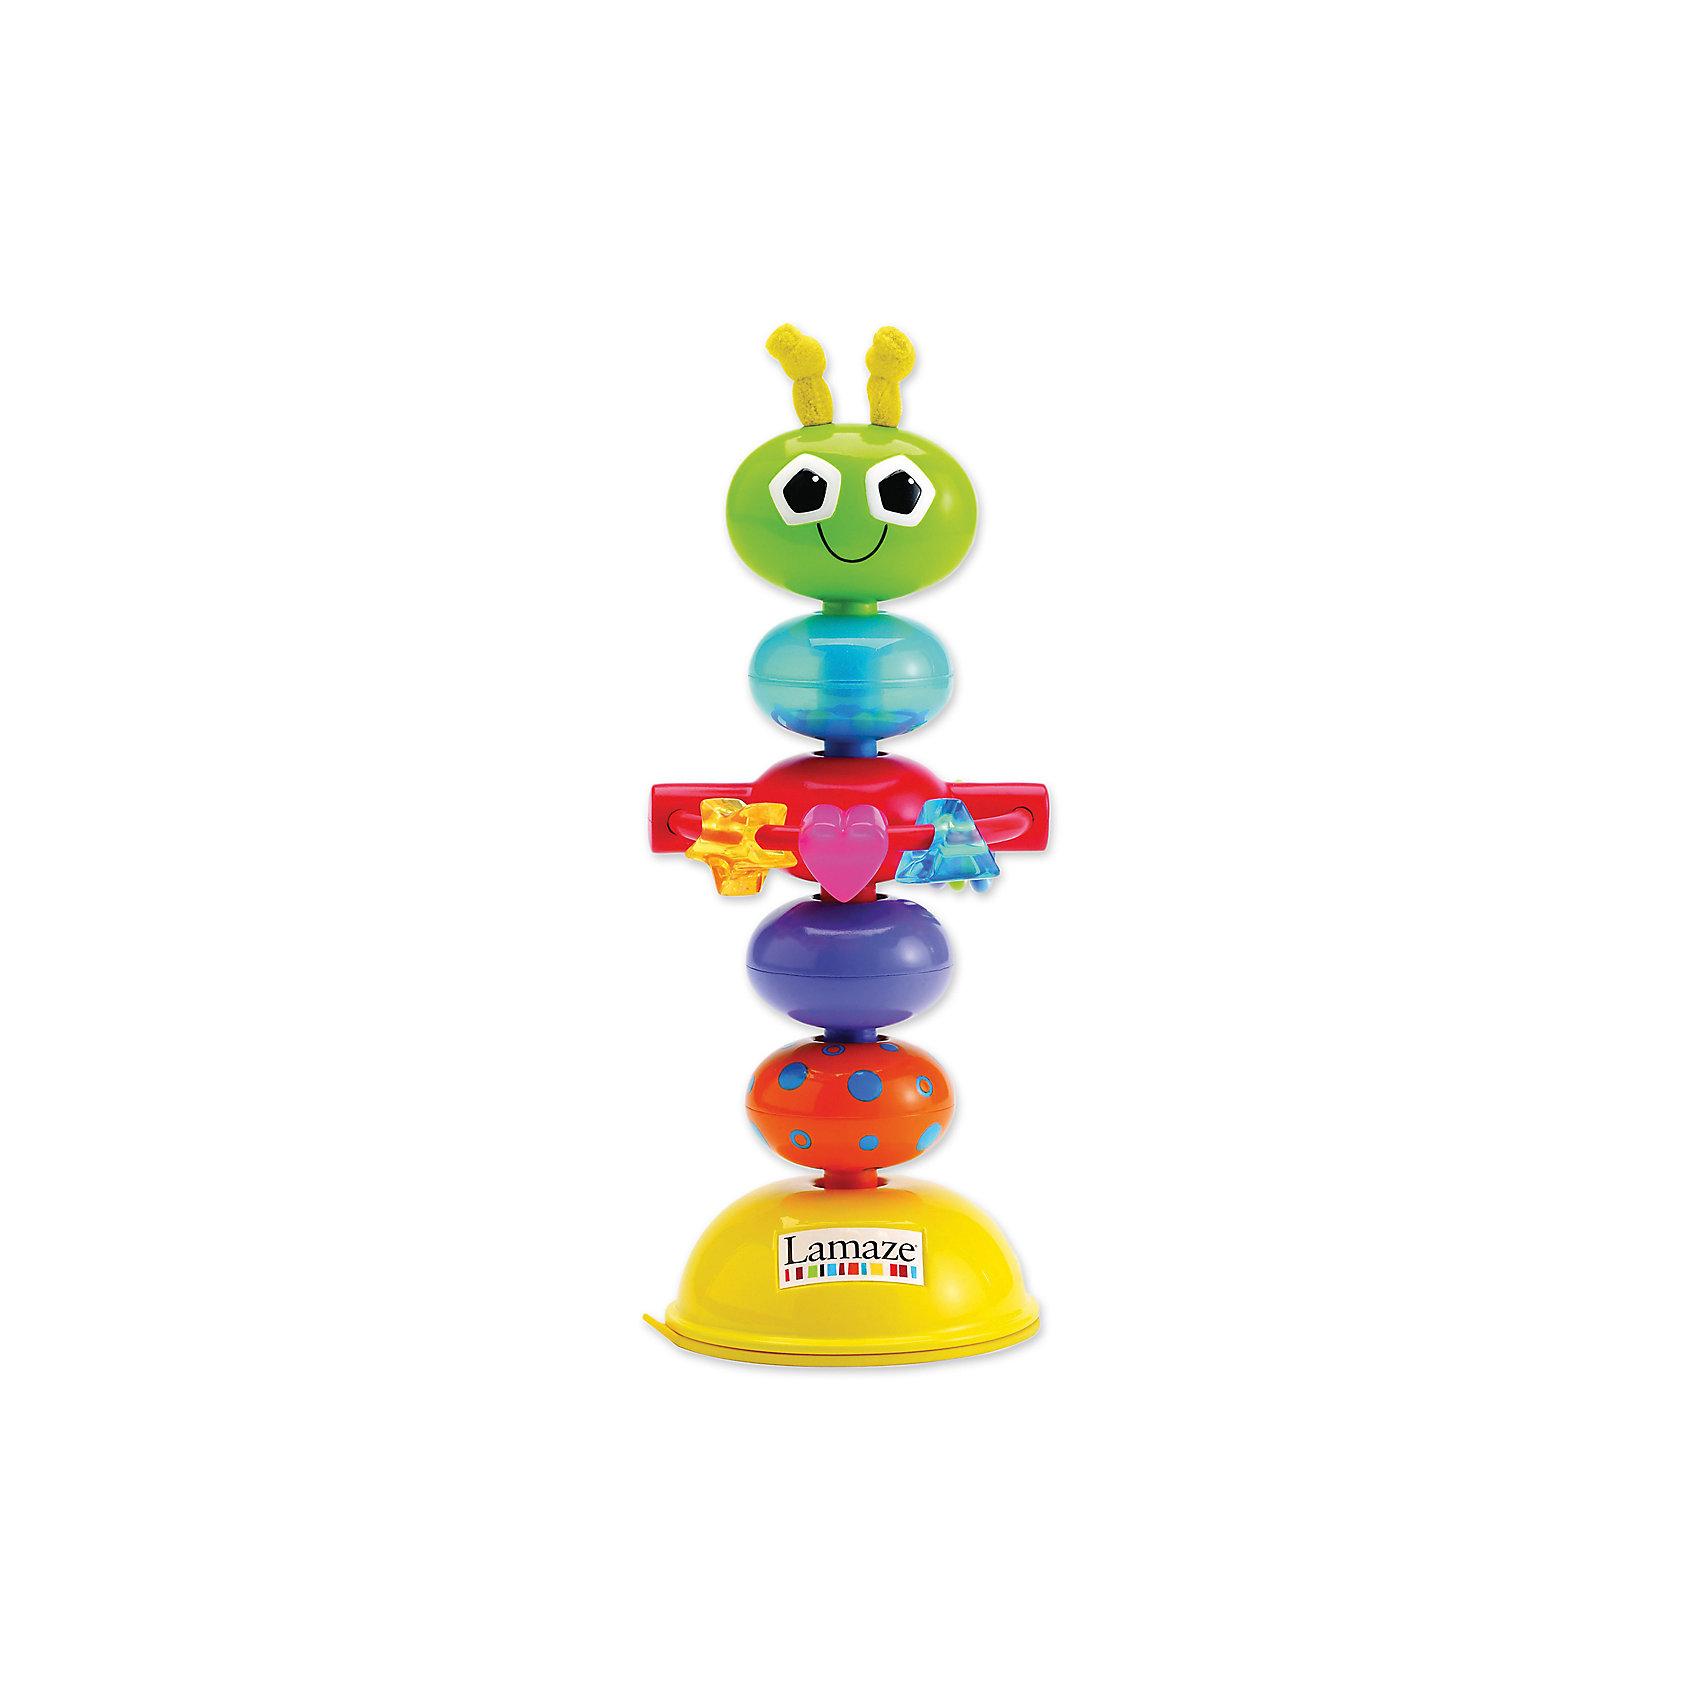 TOMY Погремушка с присоской Деловой Жучок, Tomy Lamaze tomy игрушка с присоской на стульчике веселые утята tomy lamaze